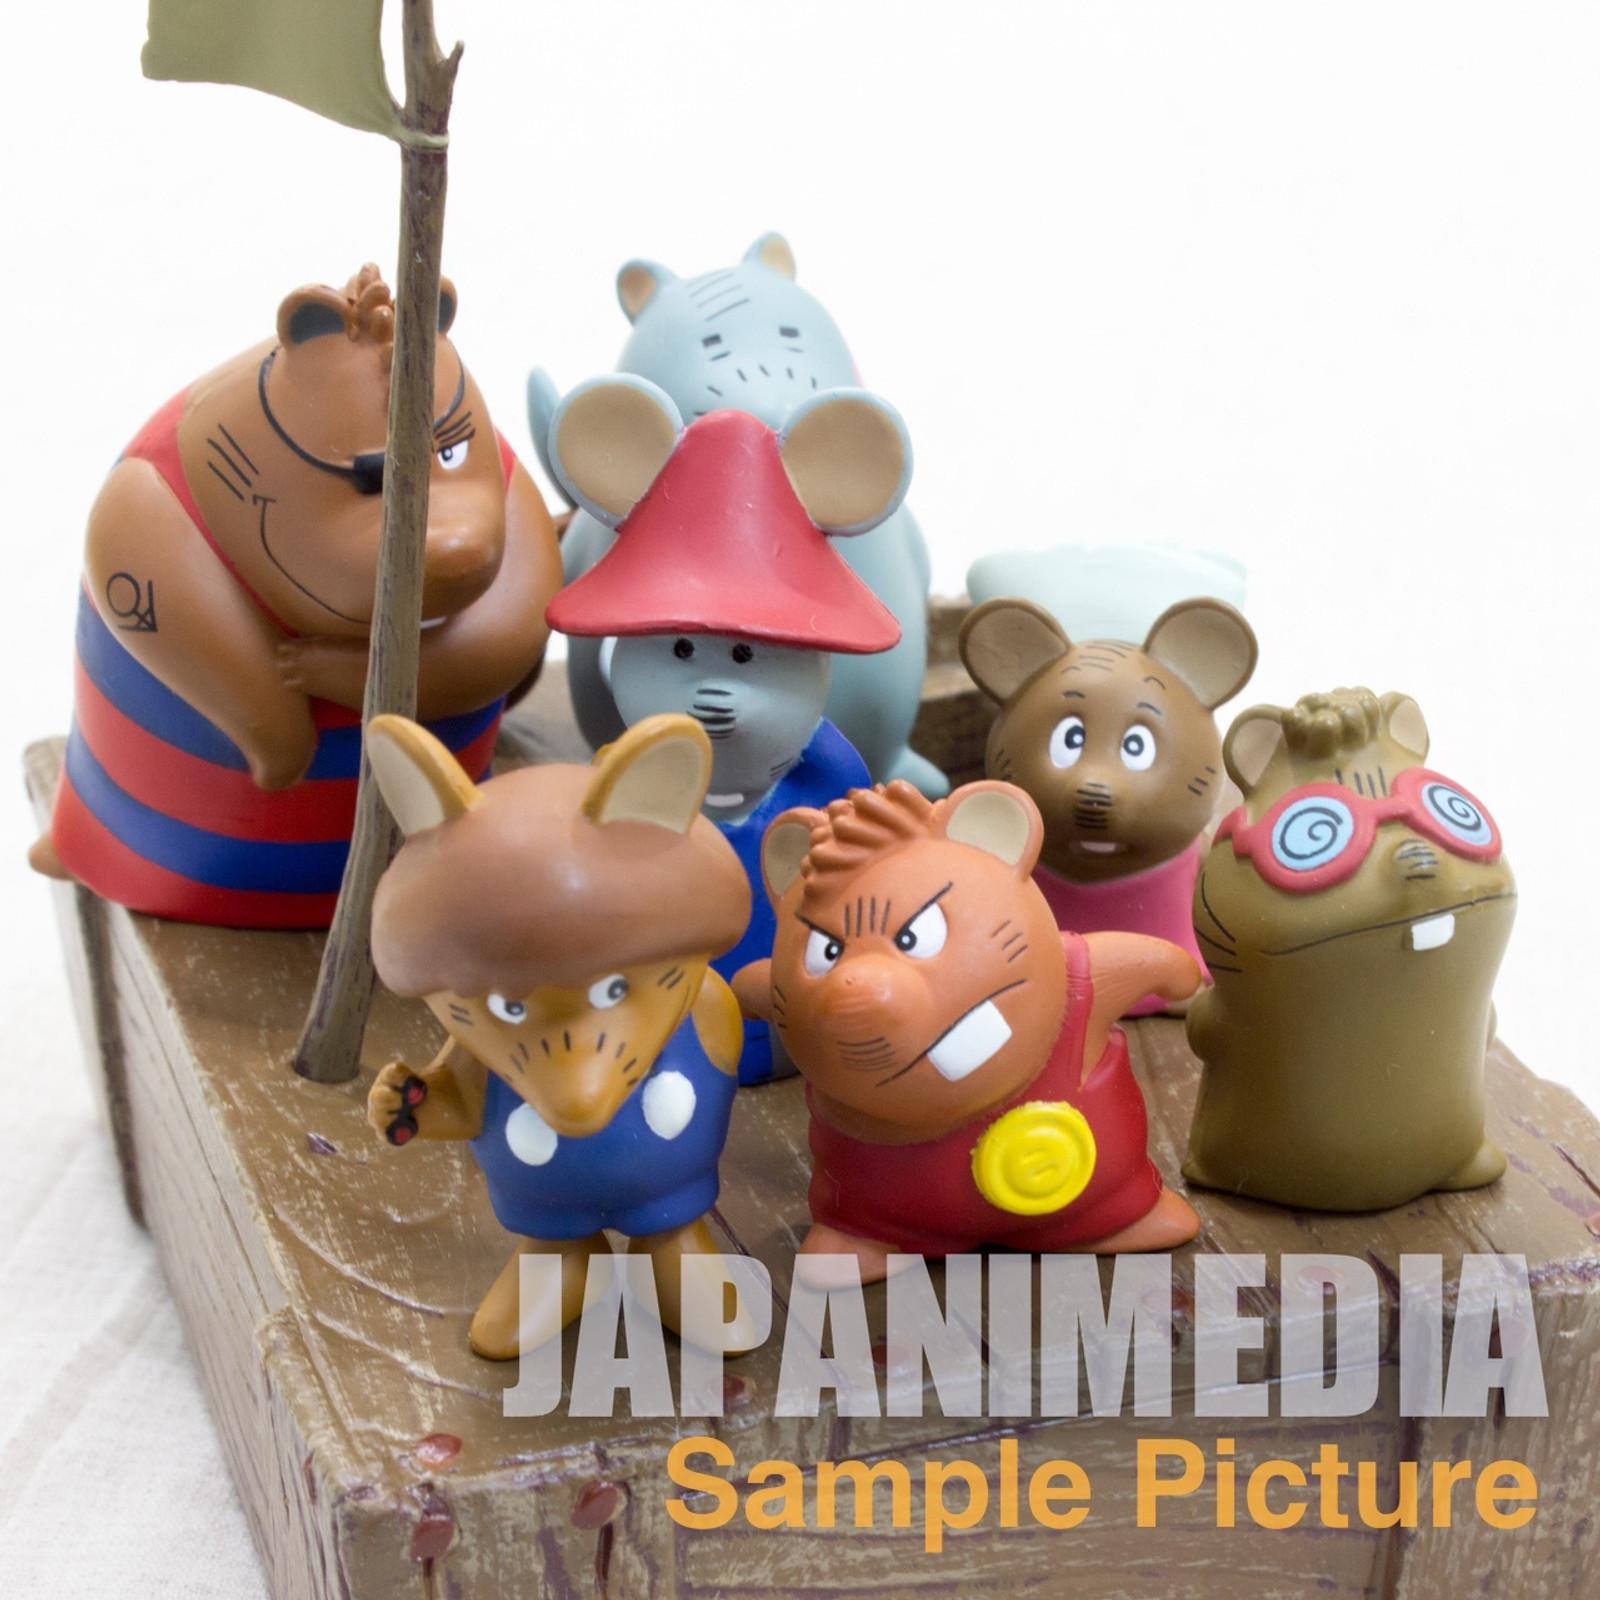 Gamba no Boken Ultra Detail Figure Medicom Toy JAPAN ANIME GANBA BOUKEN